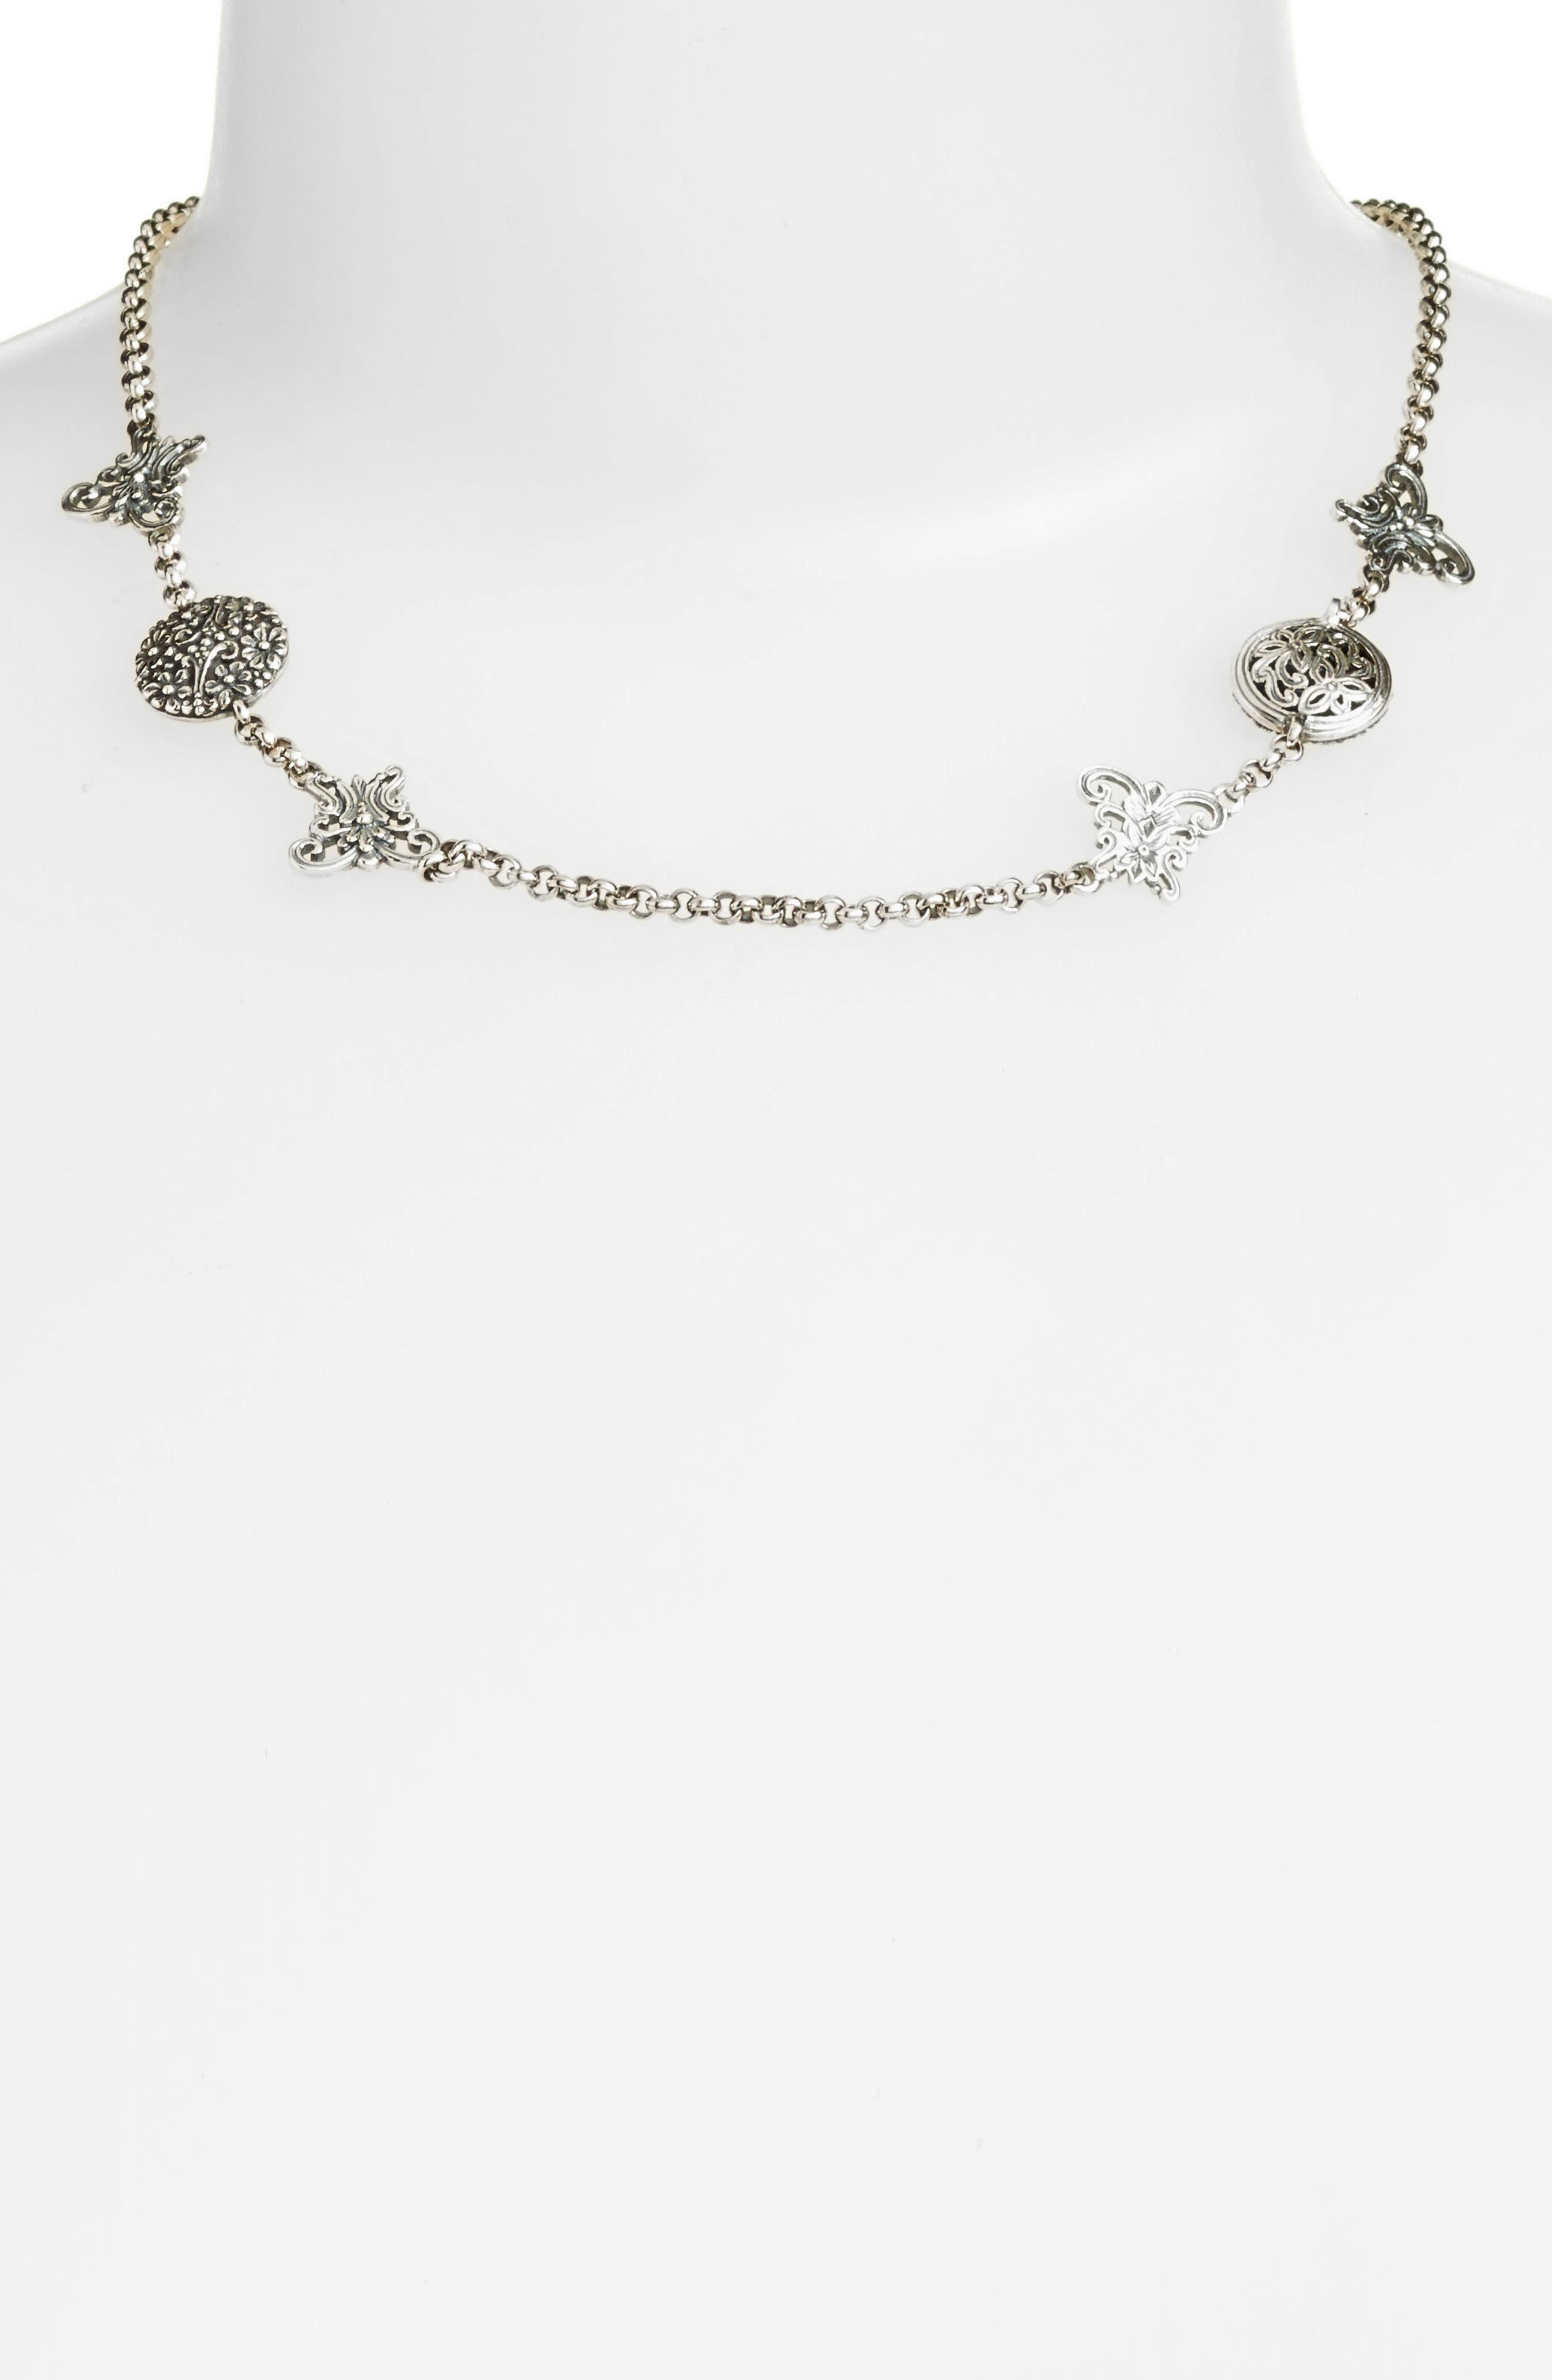 Konstantino Santorini Butterfly Collar Necklace